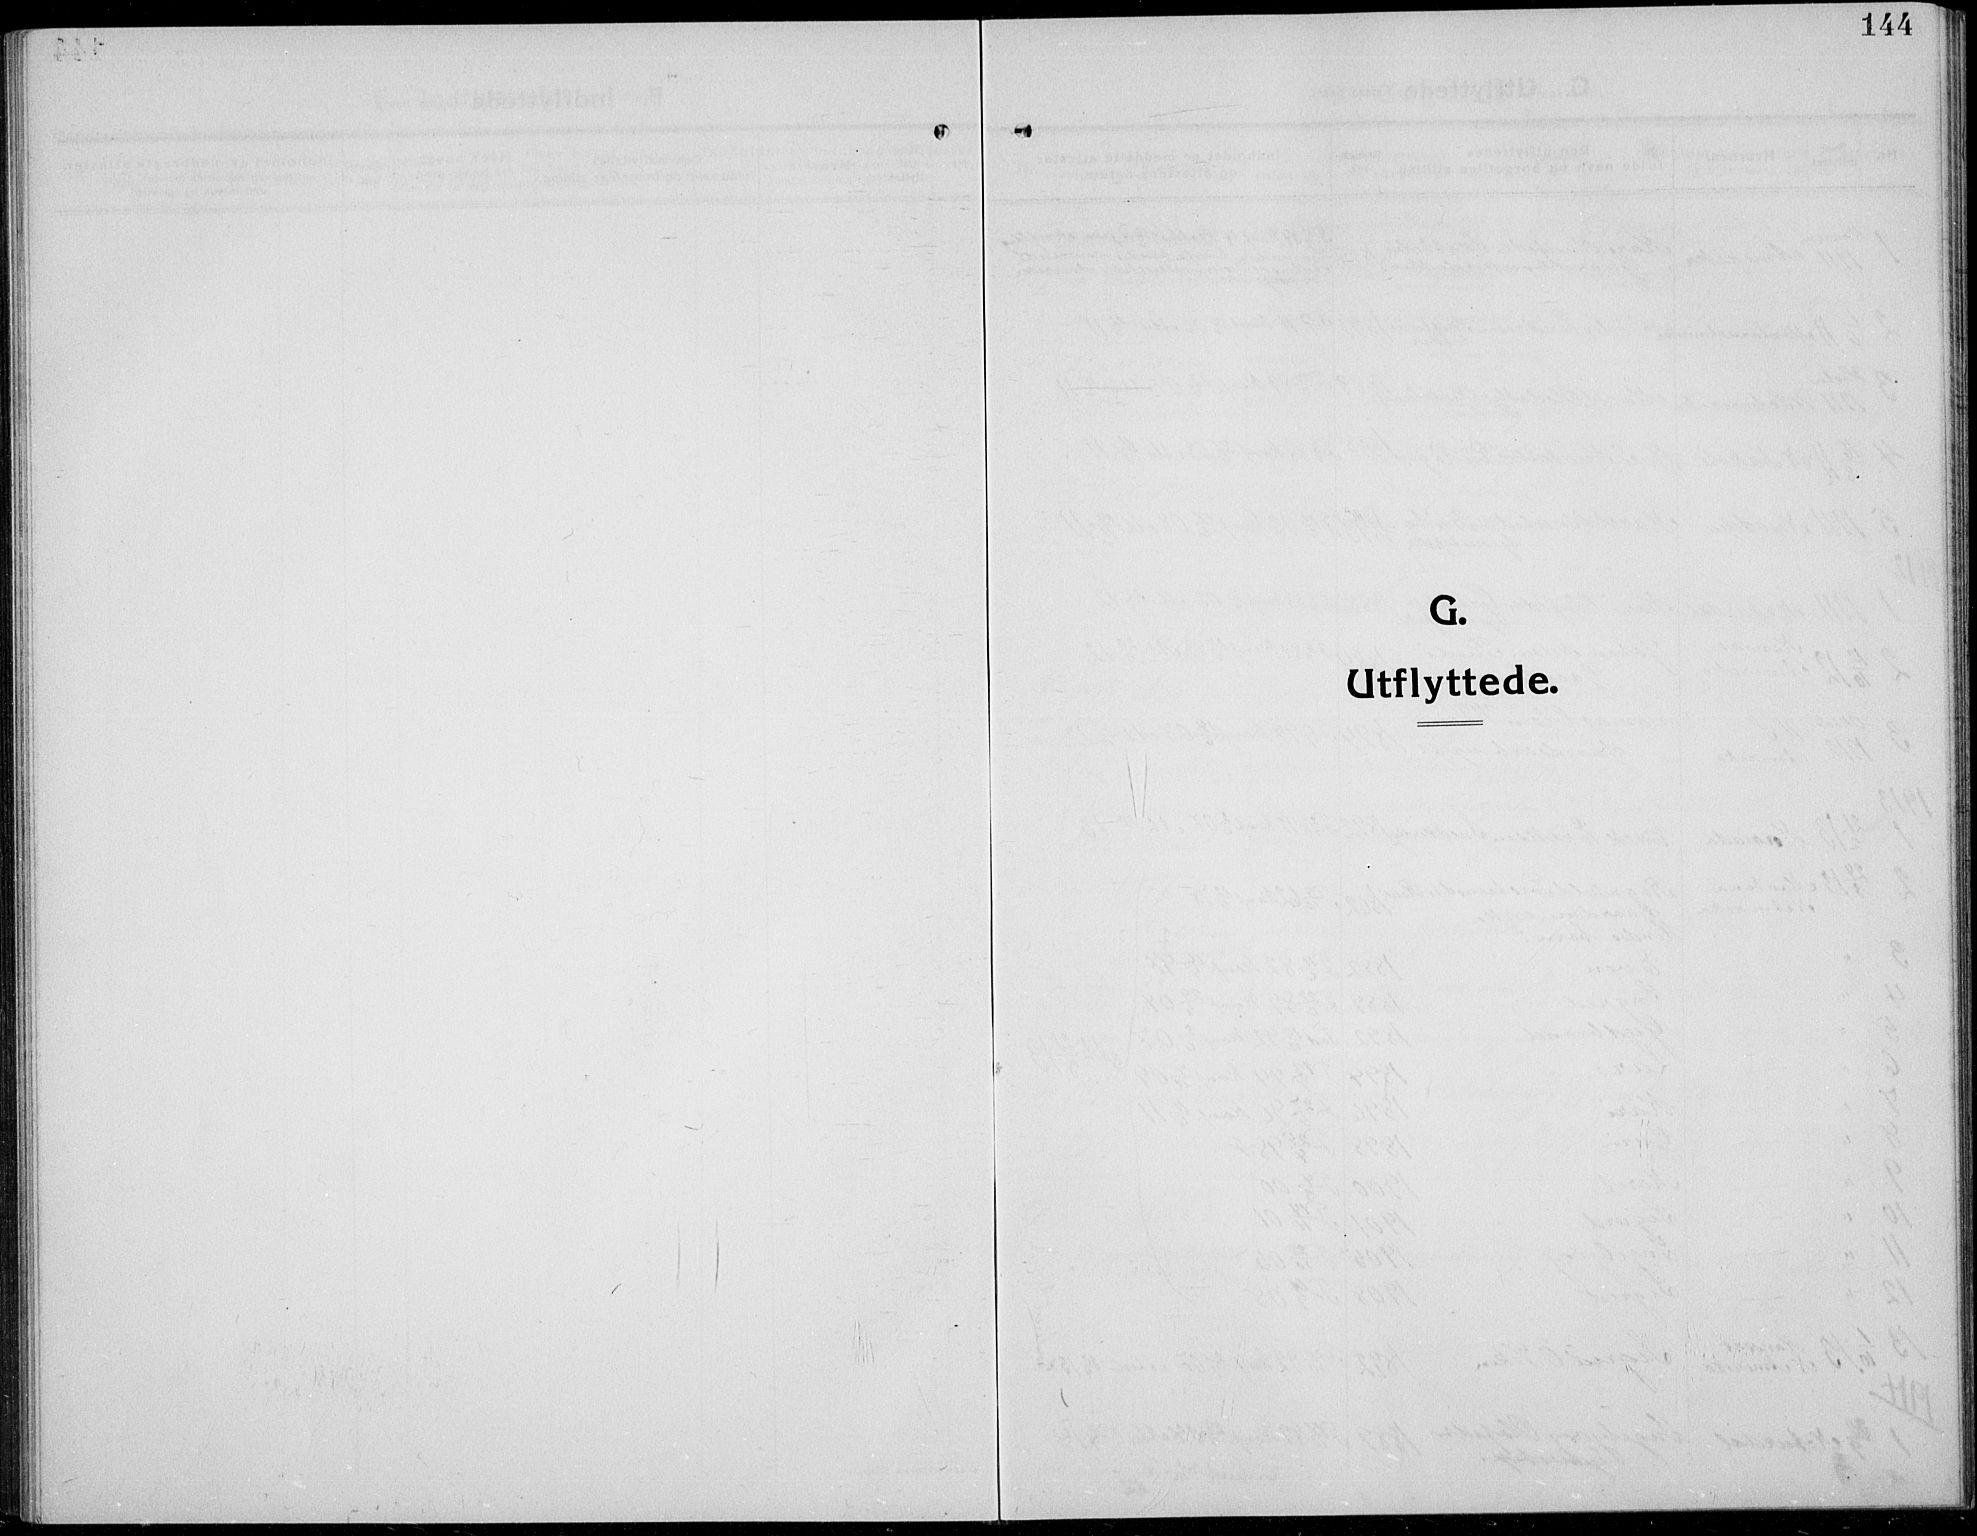 SAH, Øystre Slidre prestekontor, Klokkerbok nr. 8, 1911-1938, s. 144